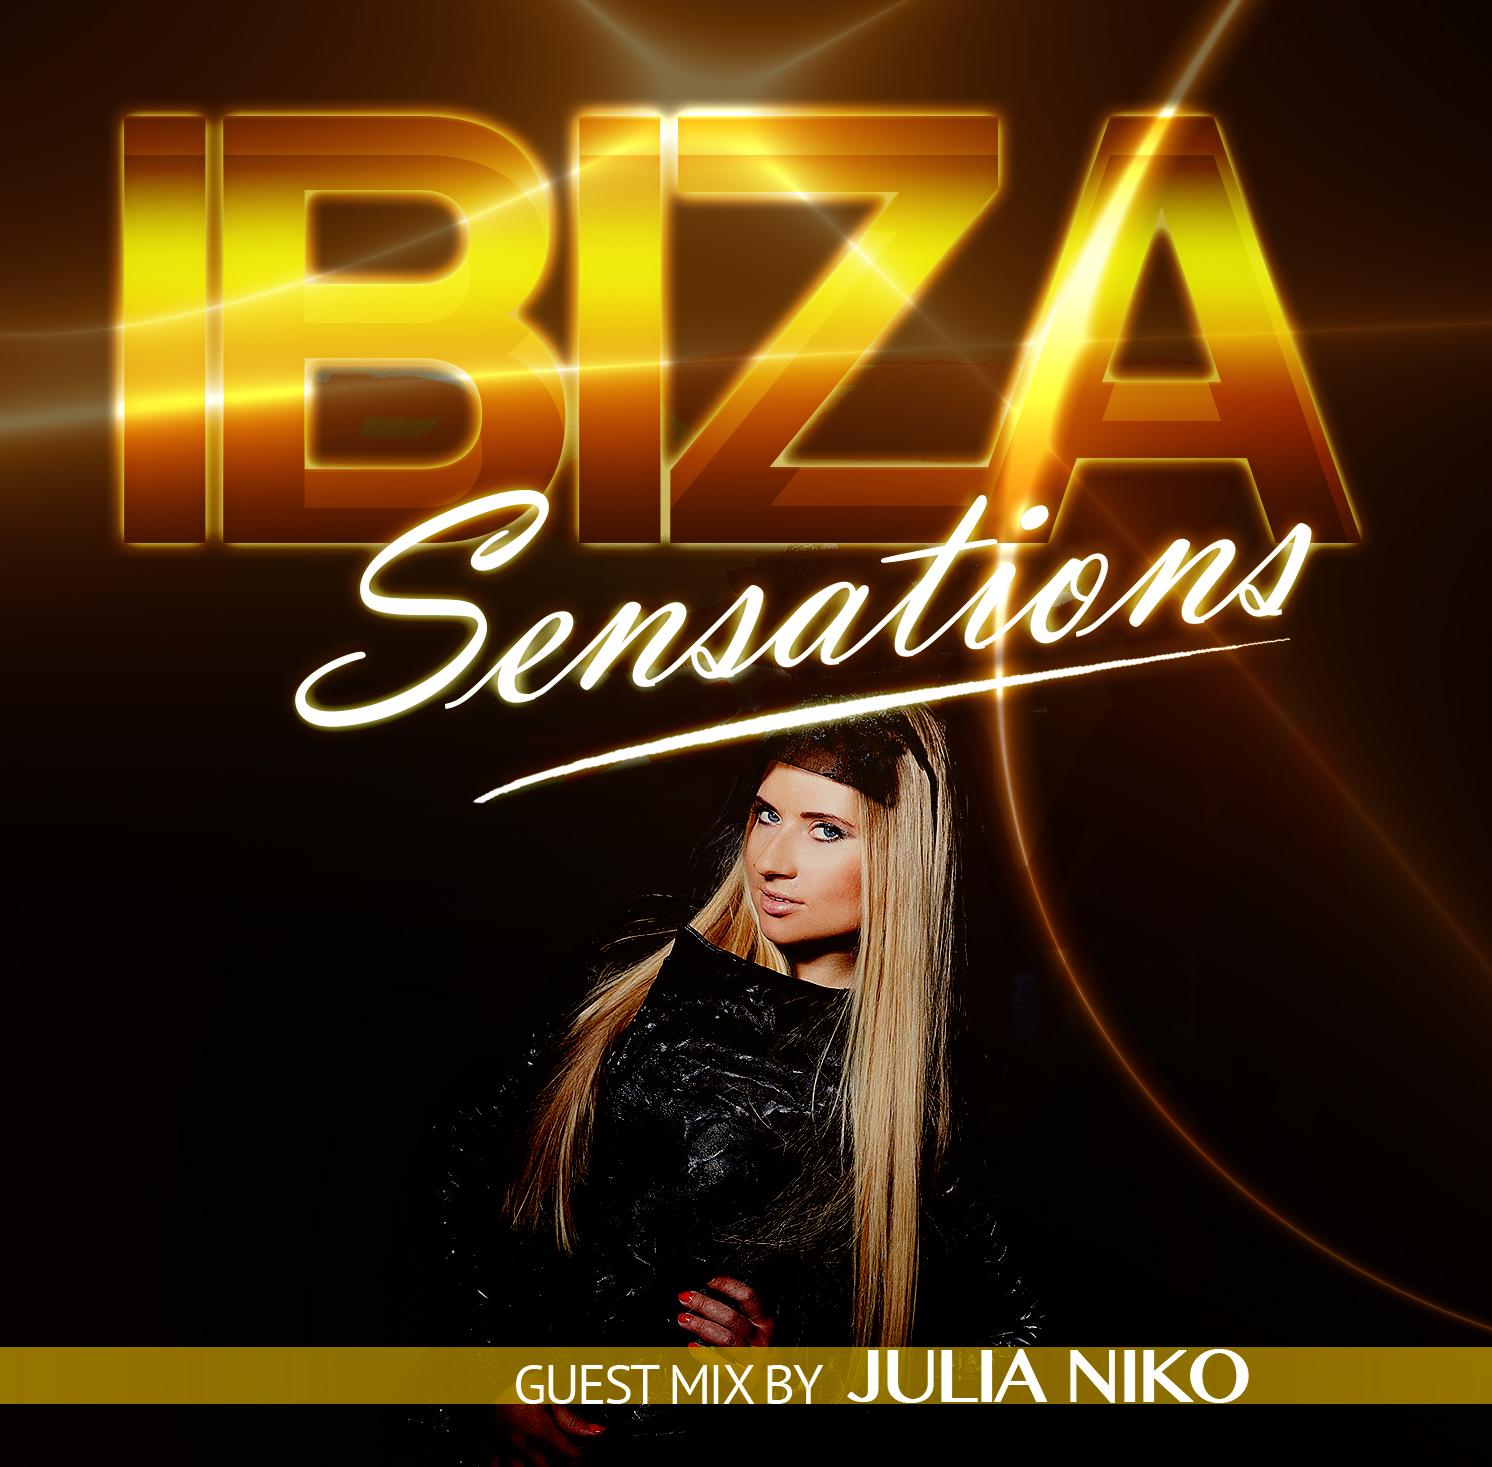 Artwork for Ibiza Sensations 90 Guest mix by Julia Niko (New York)